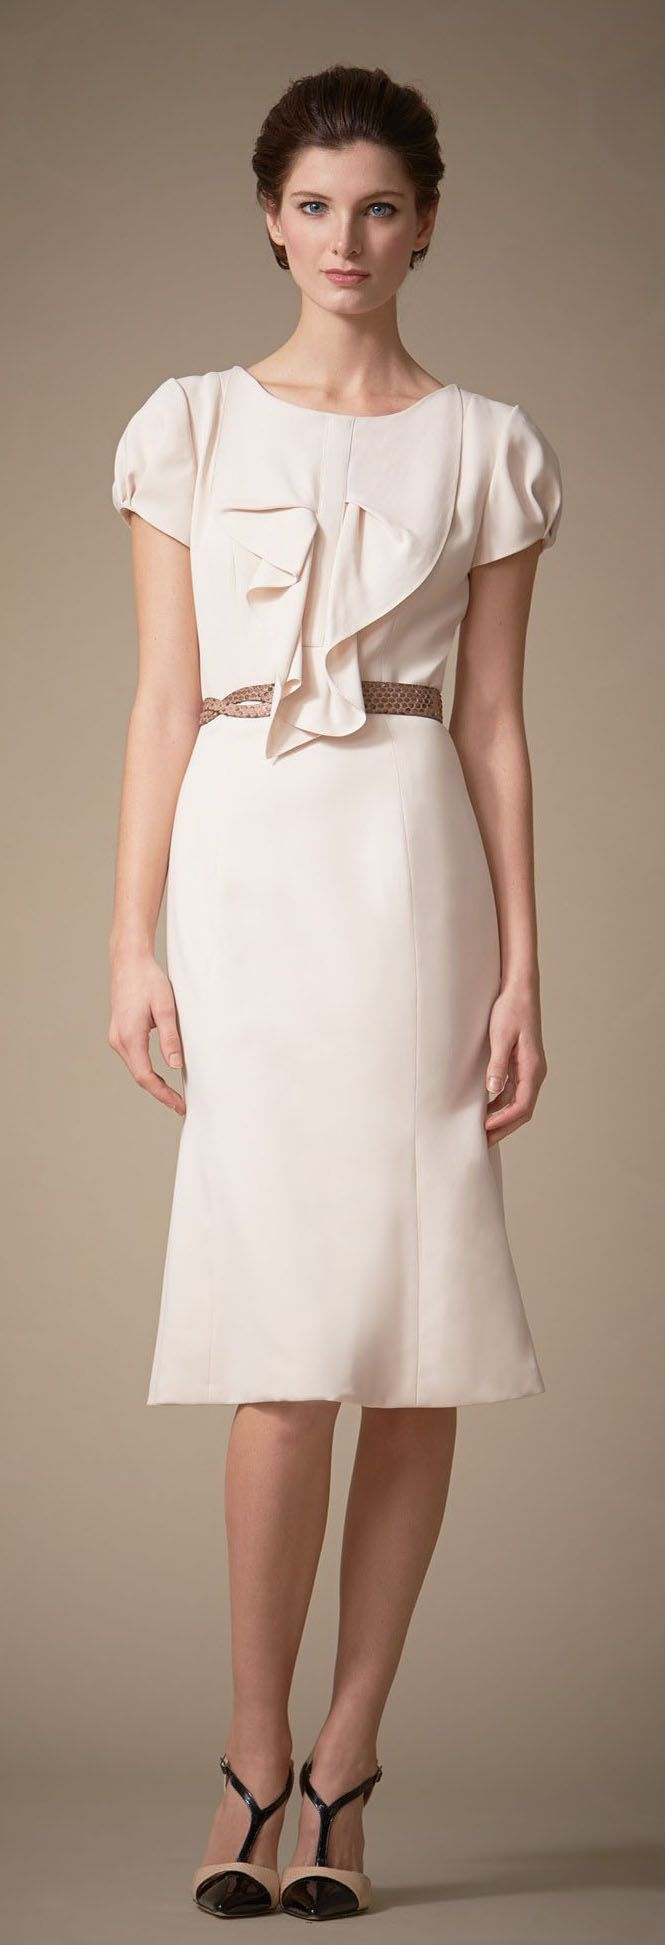 Carolina Herrera Pre Fall 2014 Collection